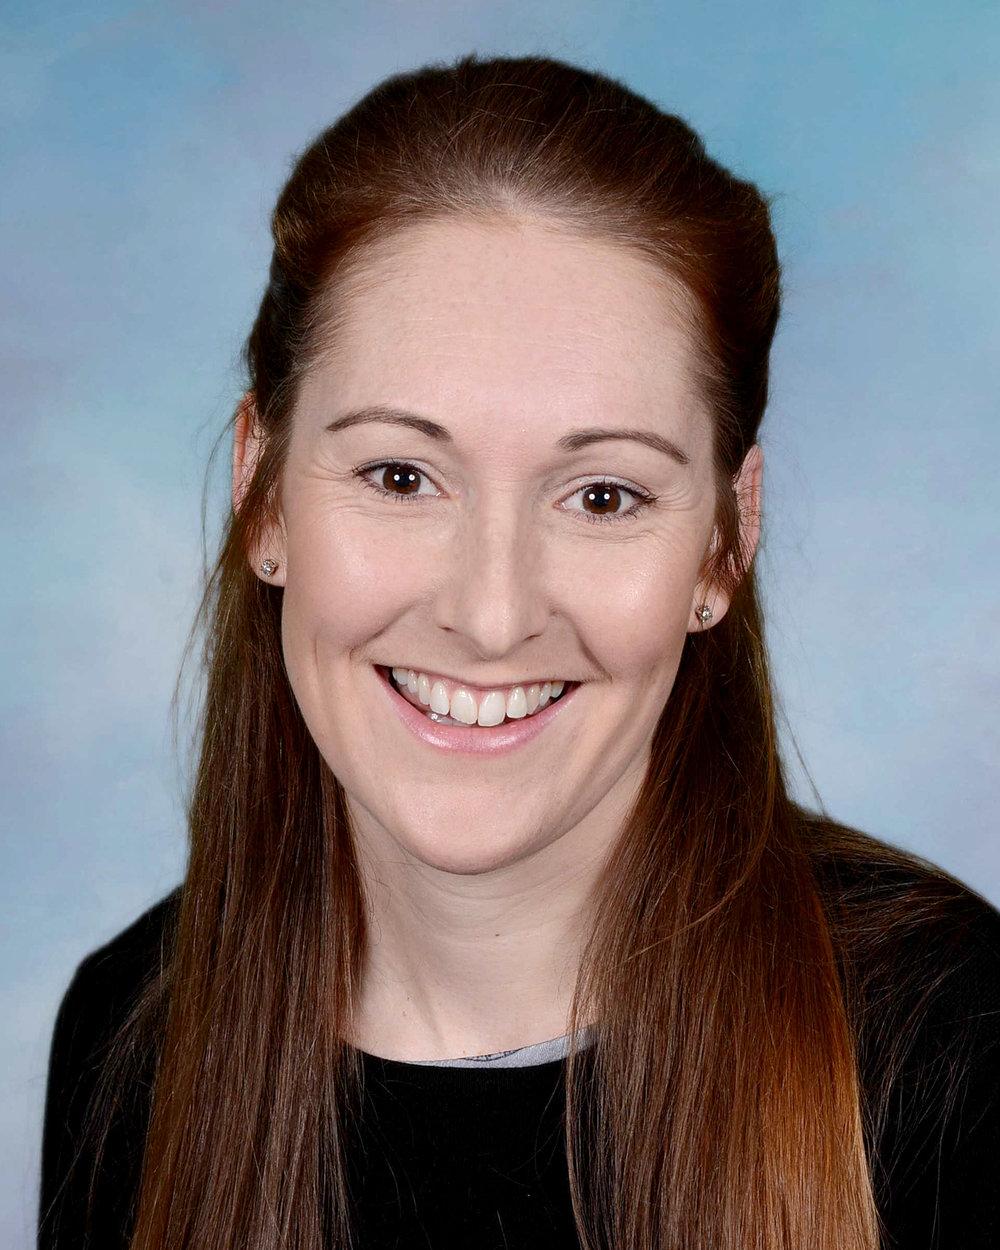 Miss J Cheers Teaching assistant